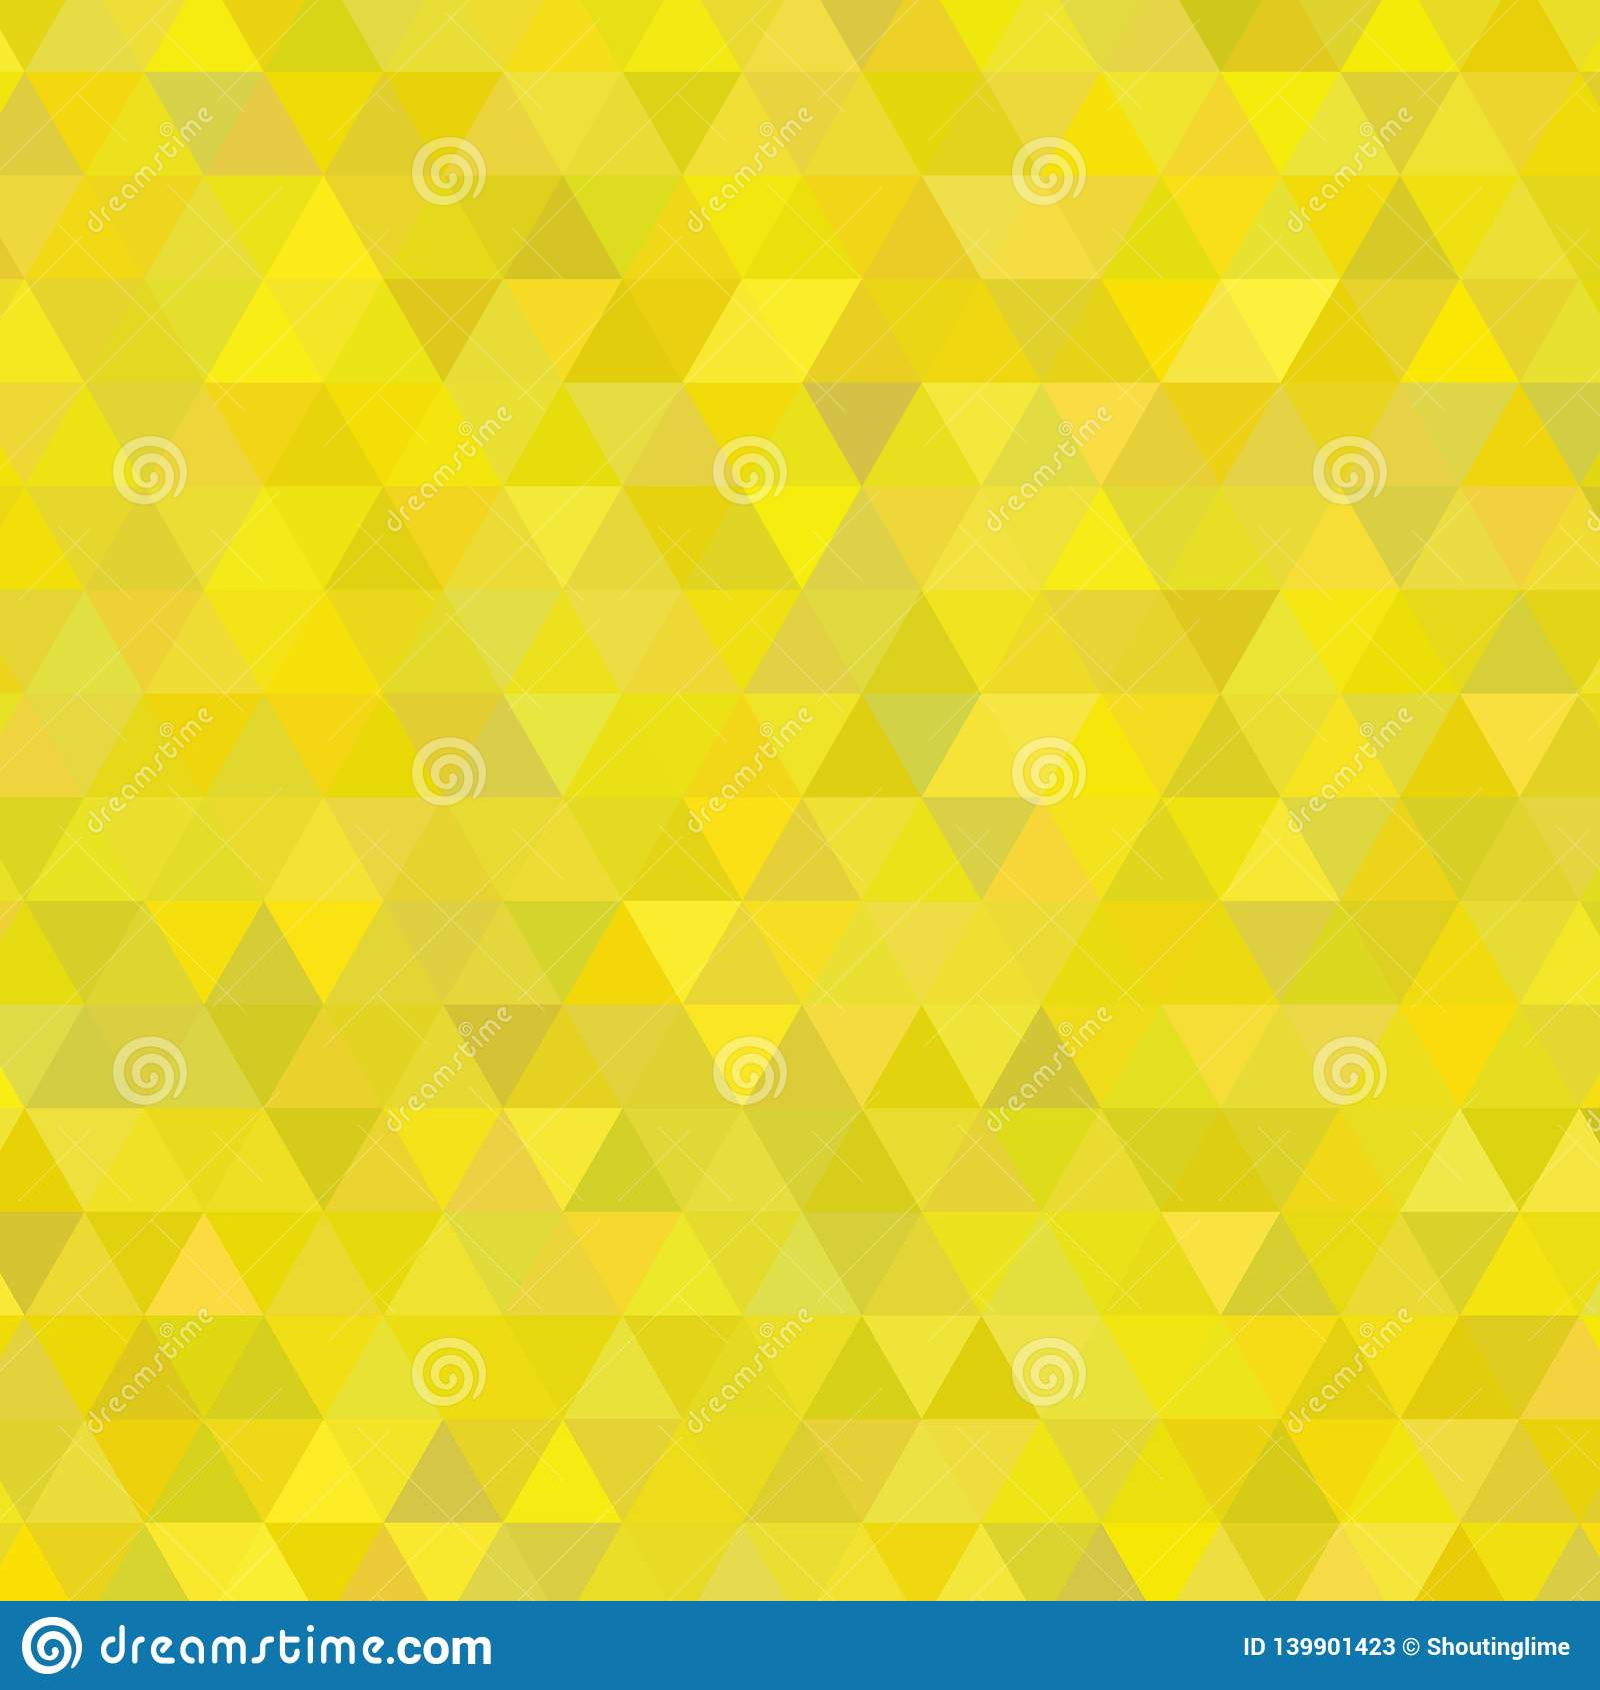 Sunny Yellow Shades Background Square van Driehoeken